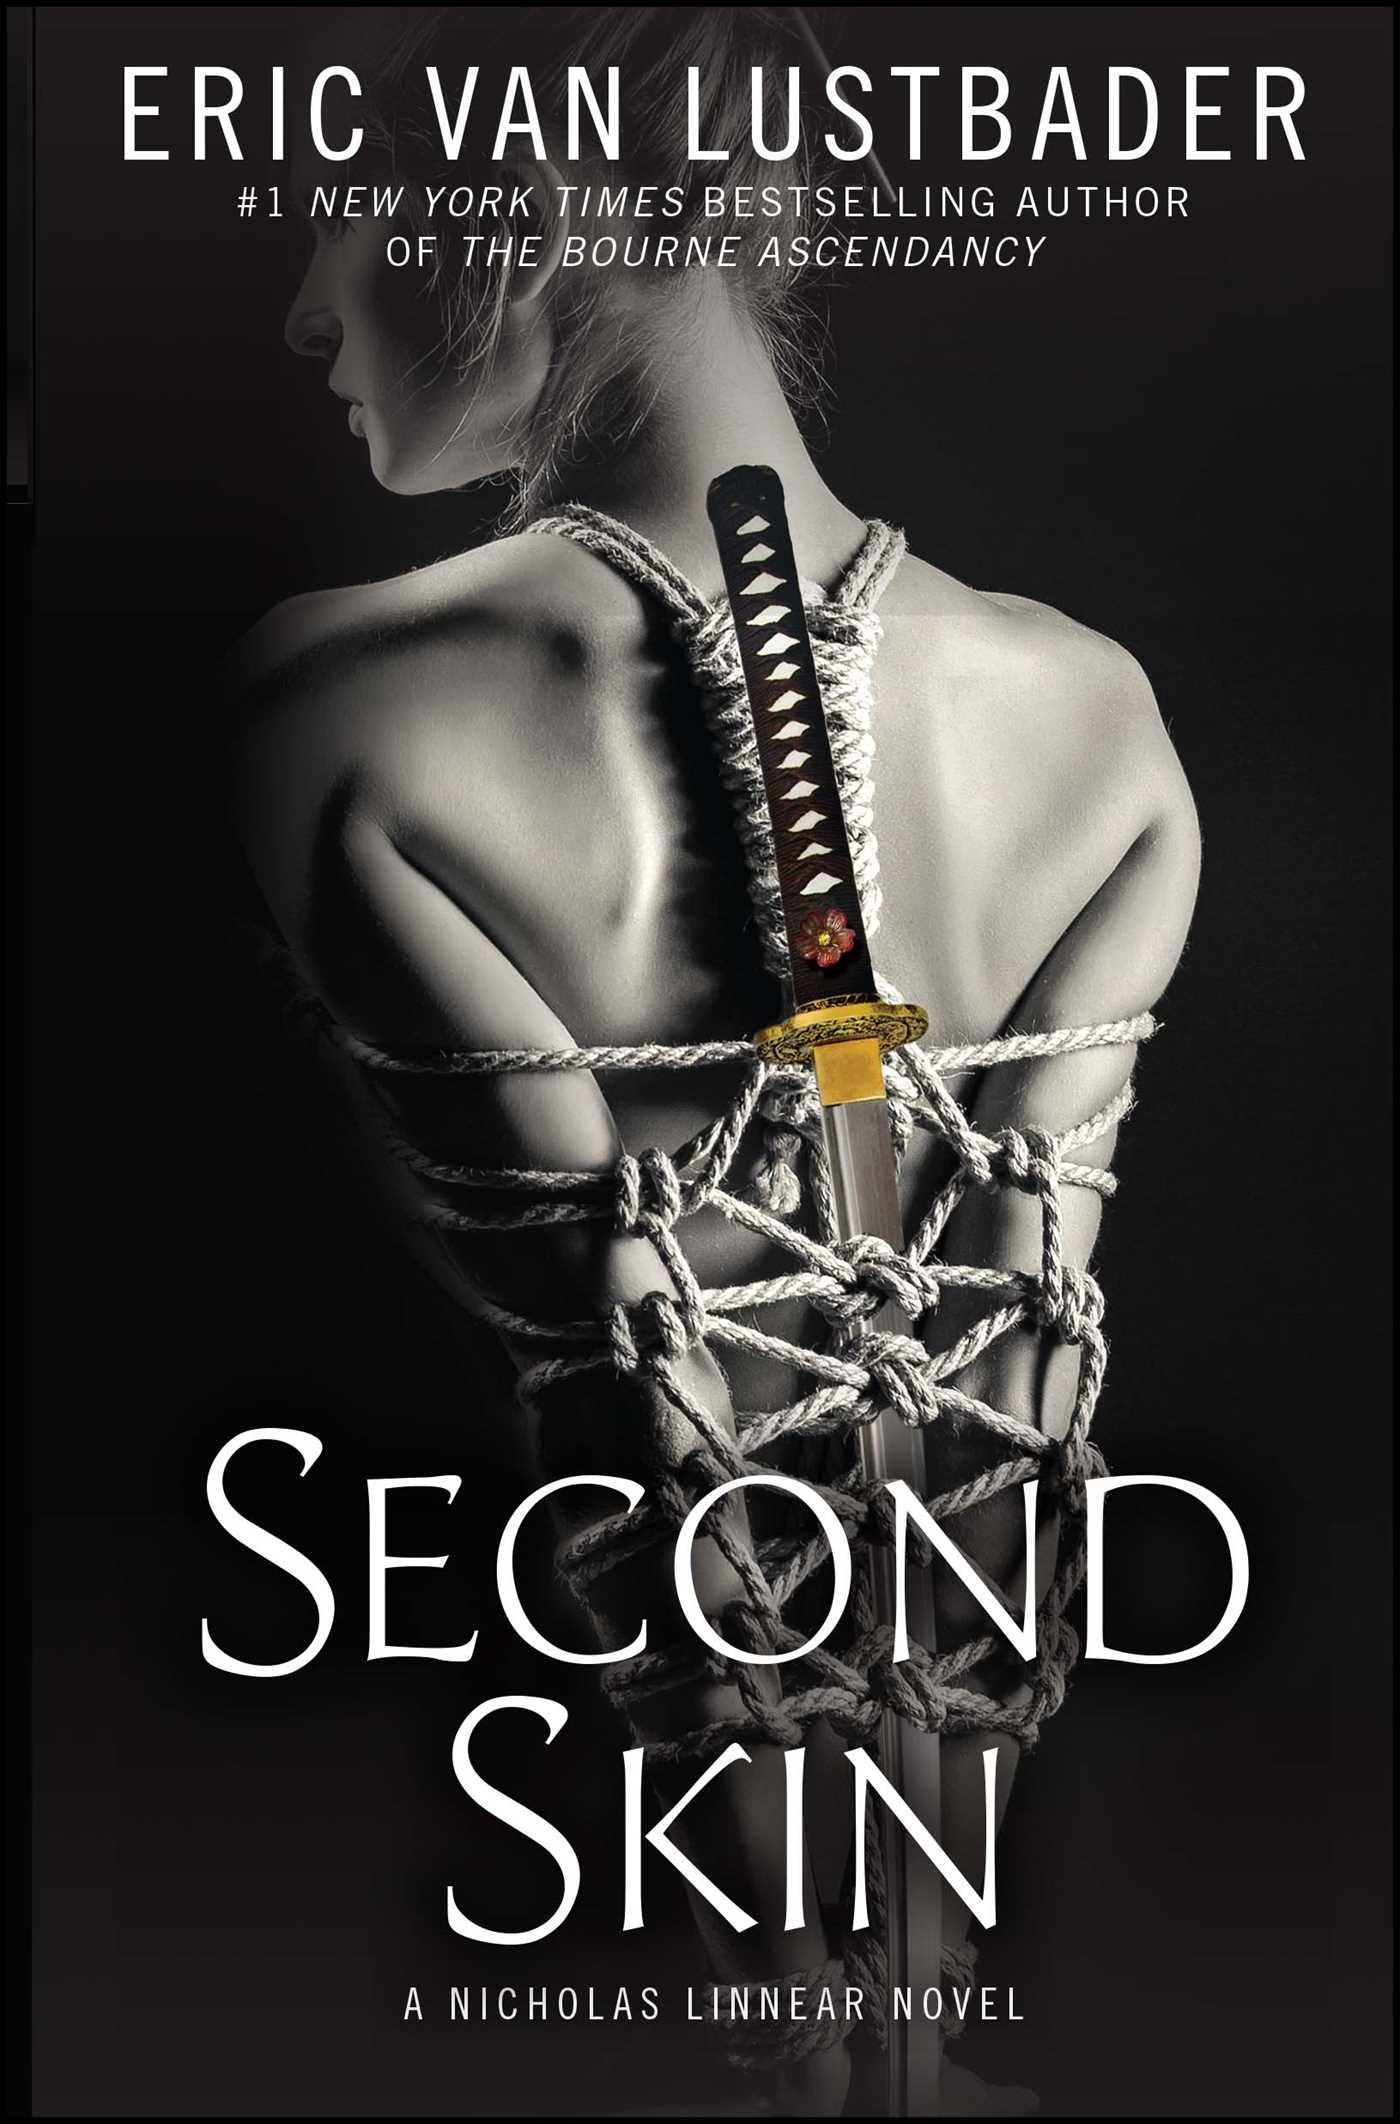 Second Skin: A Nicholas Linnear Novel: Amazon.es: Eric Van ...